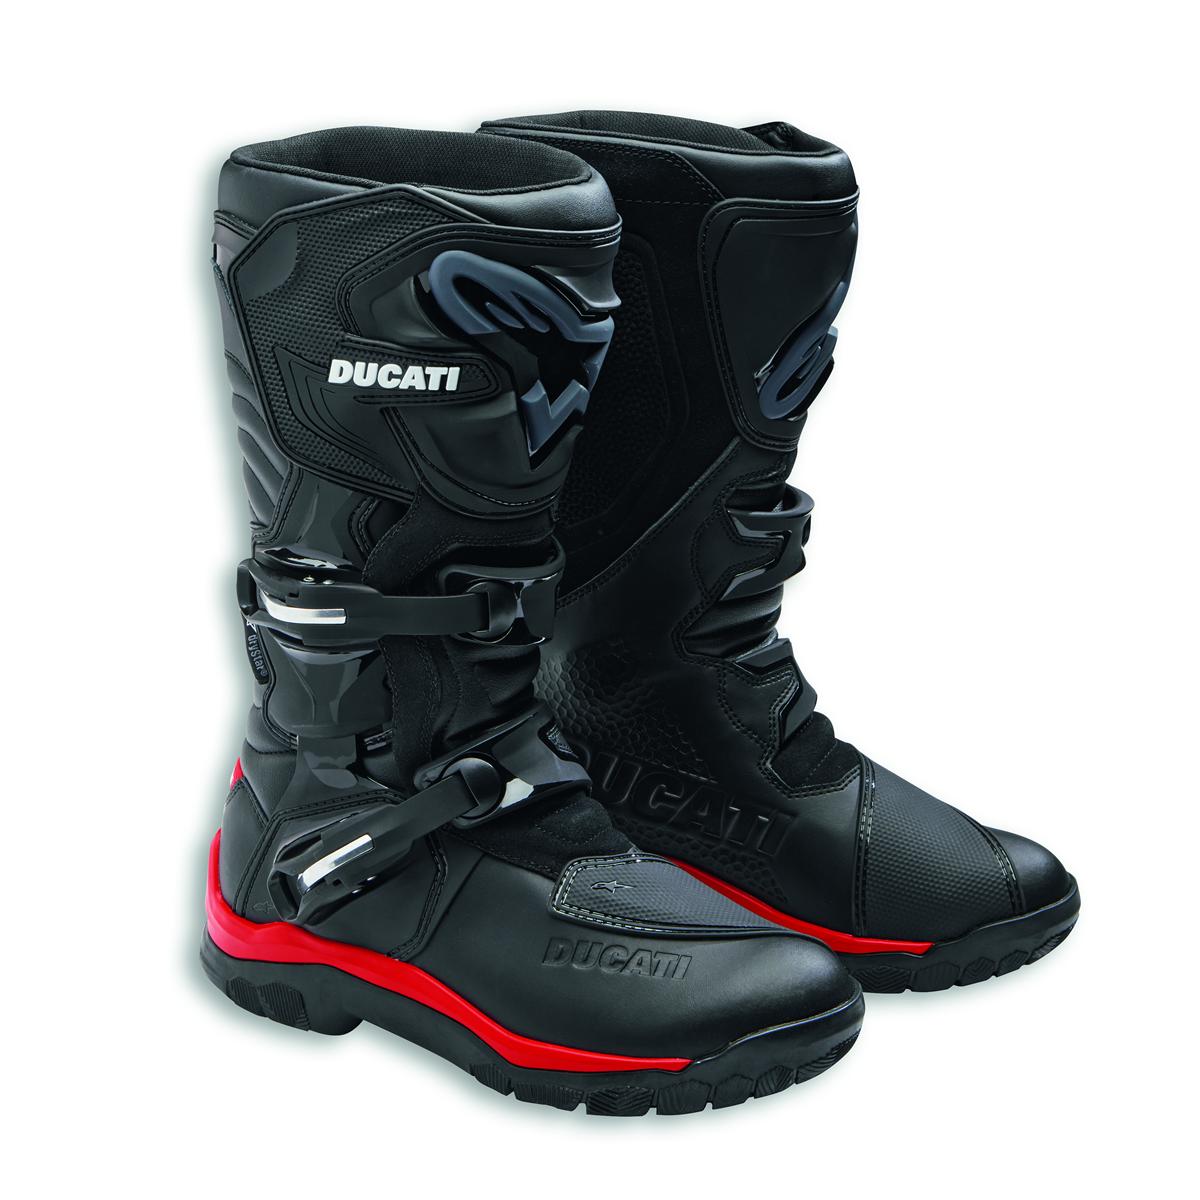 Atacama WP C1 - Touring-Adventure Boots 981049070